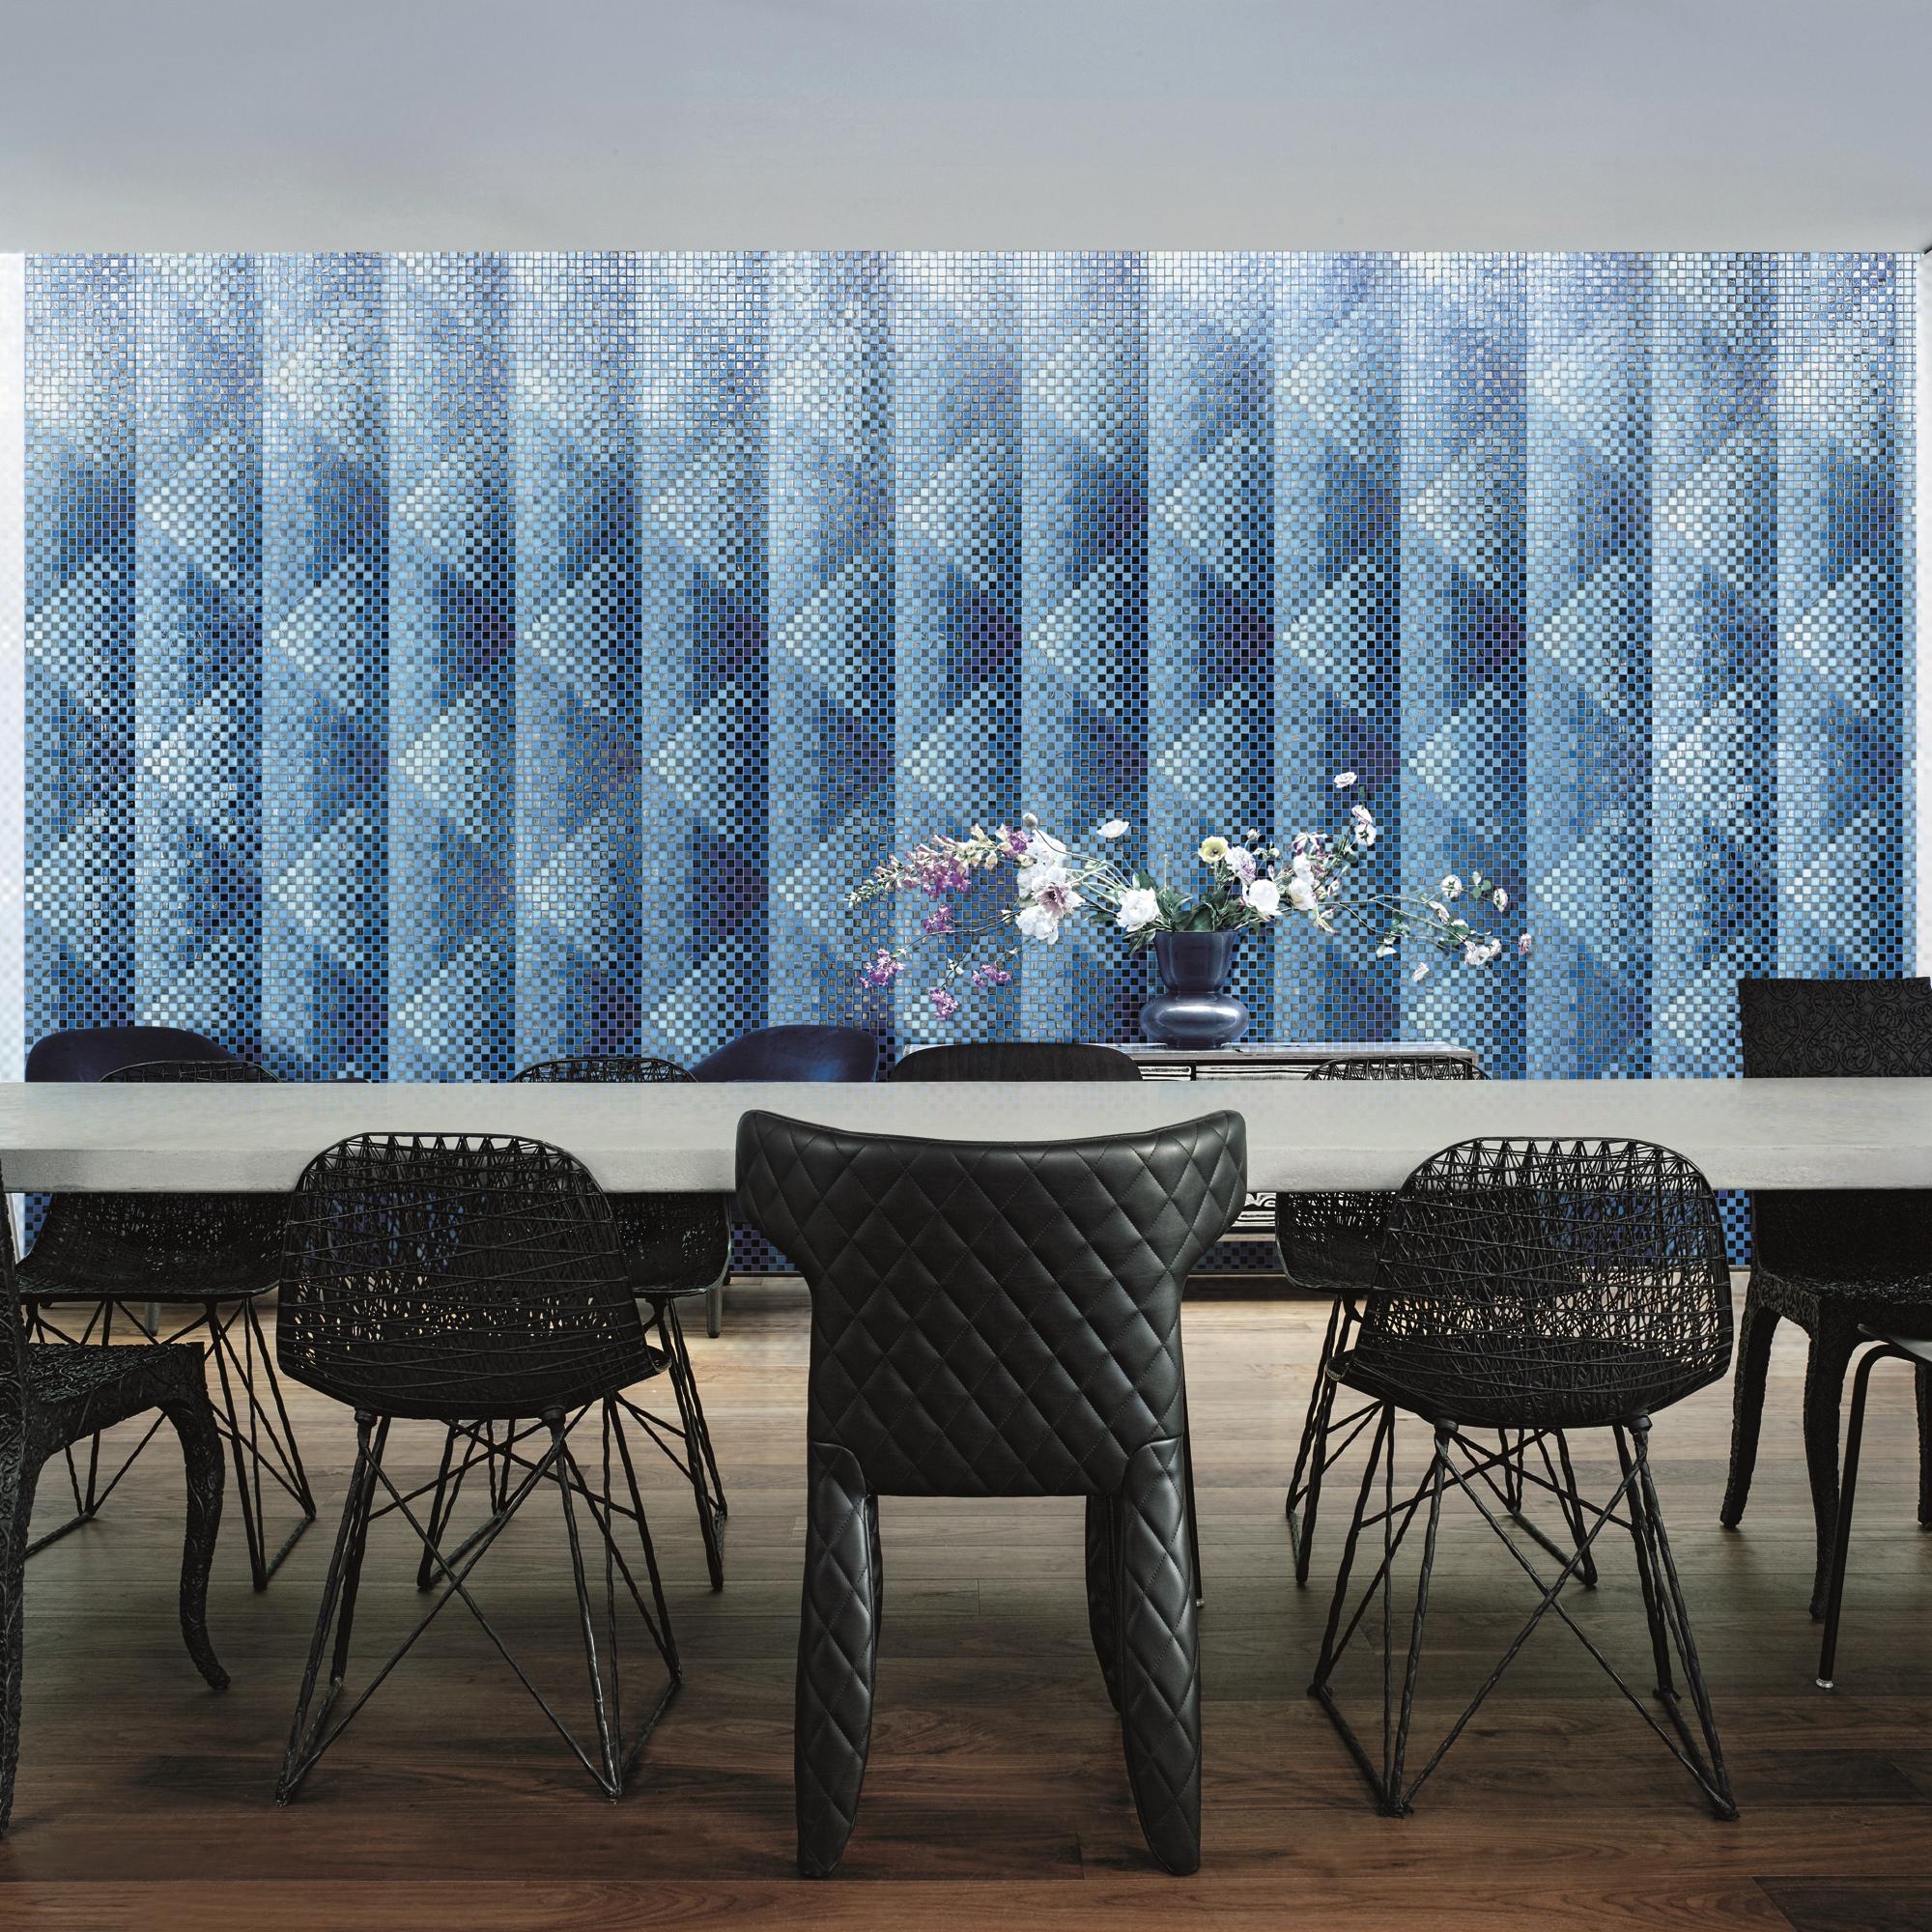 Glass mosaic - new decorations